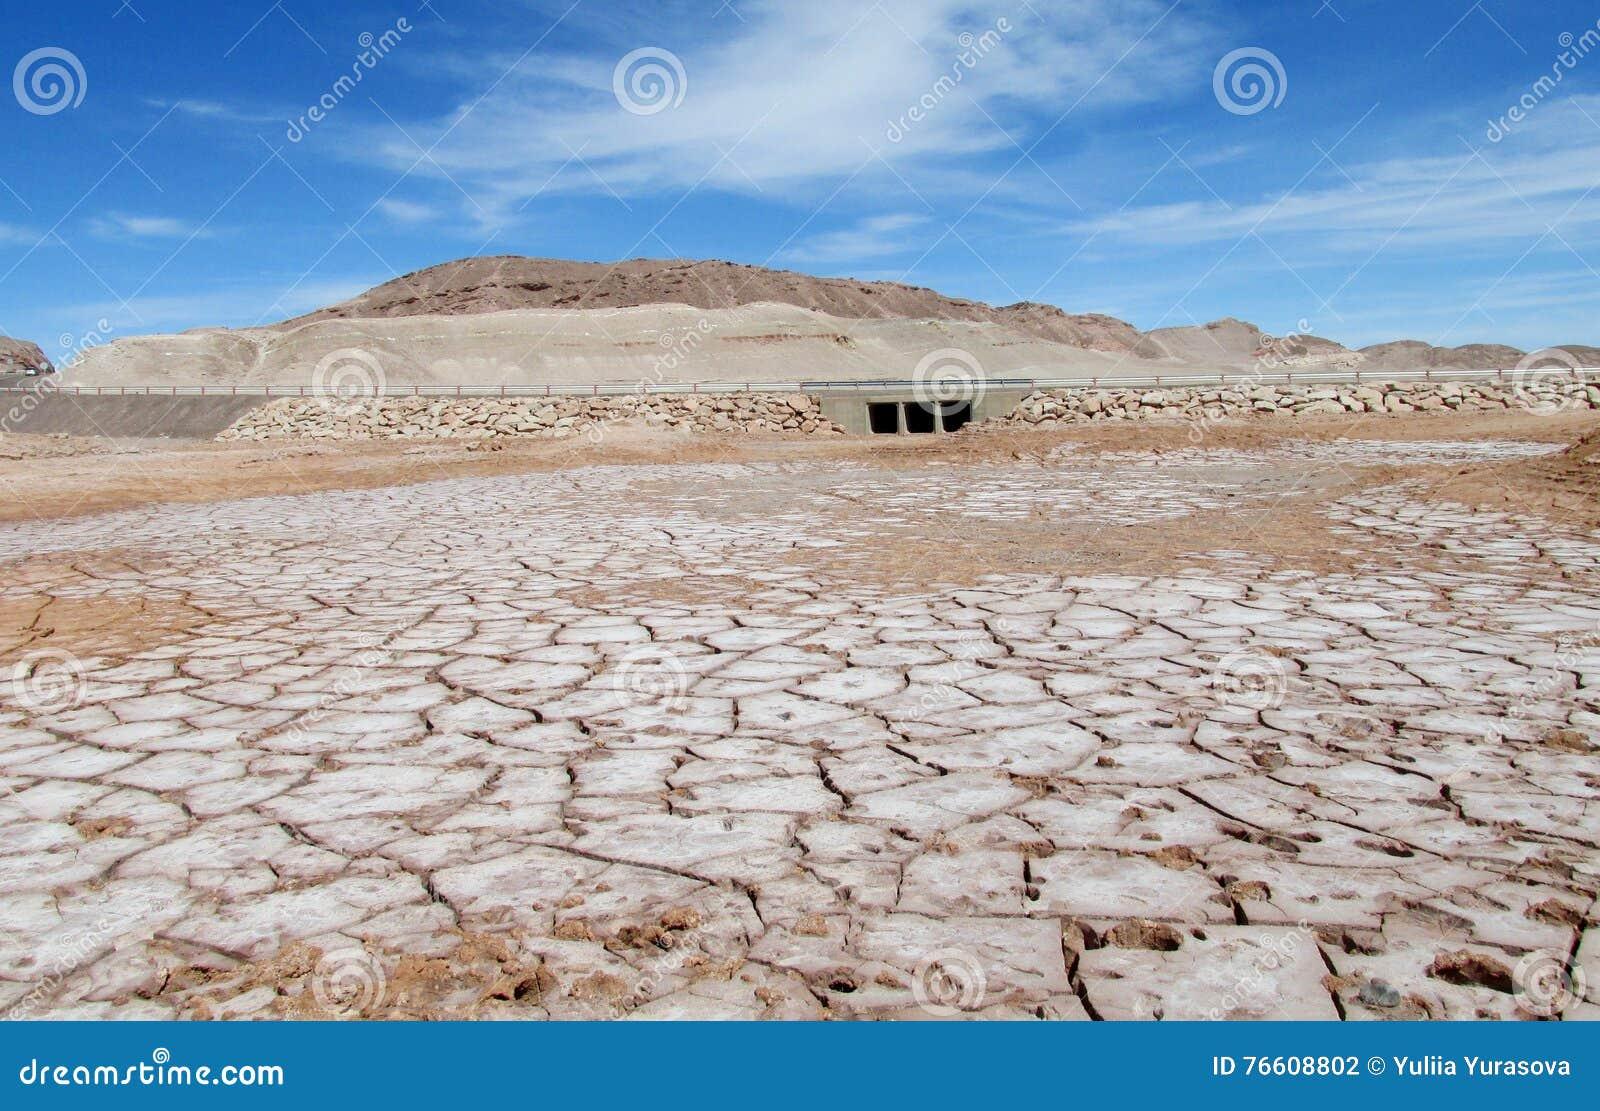 Dry salty soil pattern in San Pedro de Atacama desert